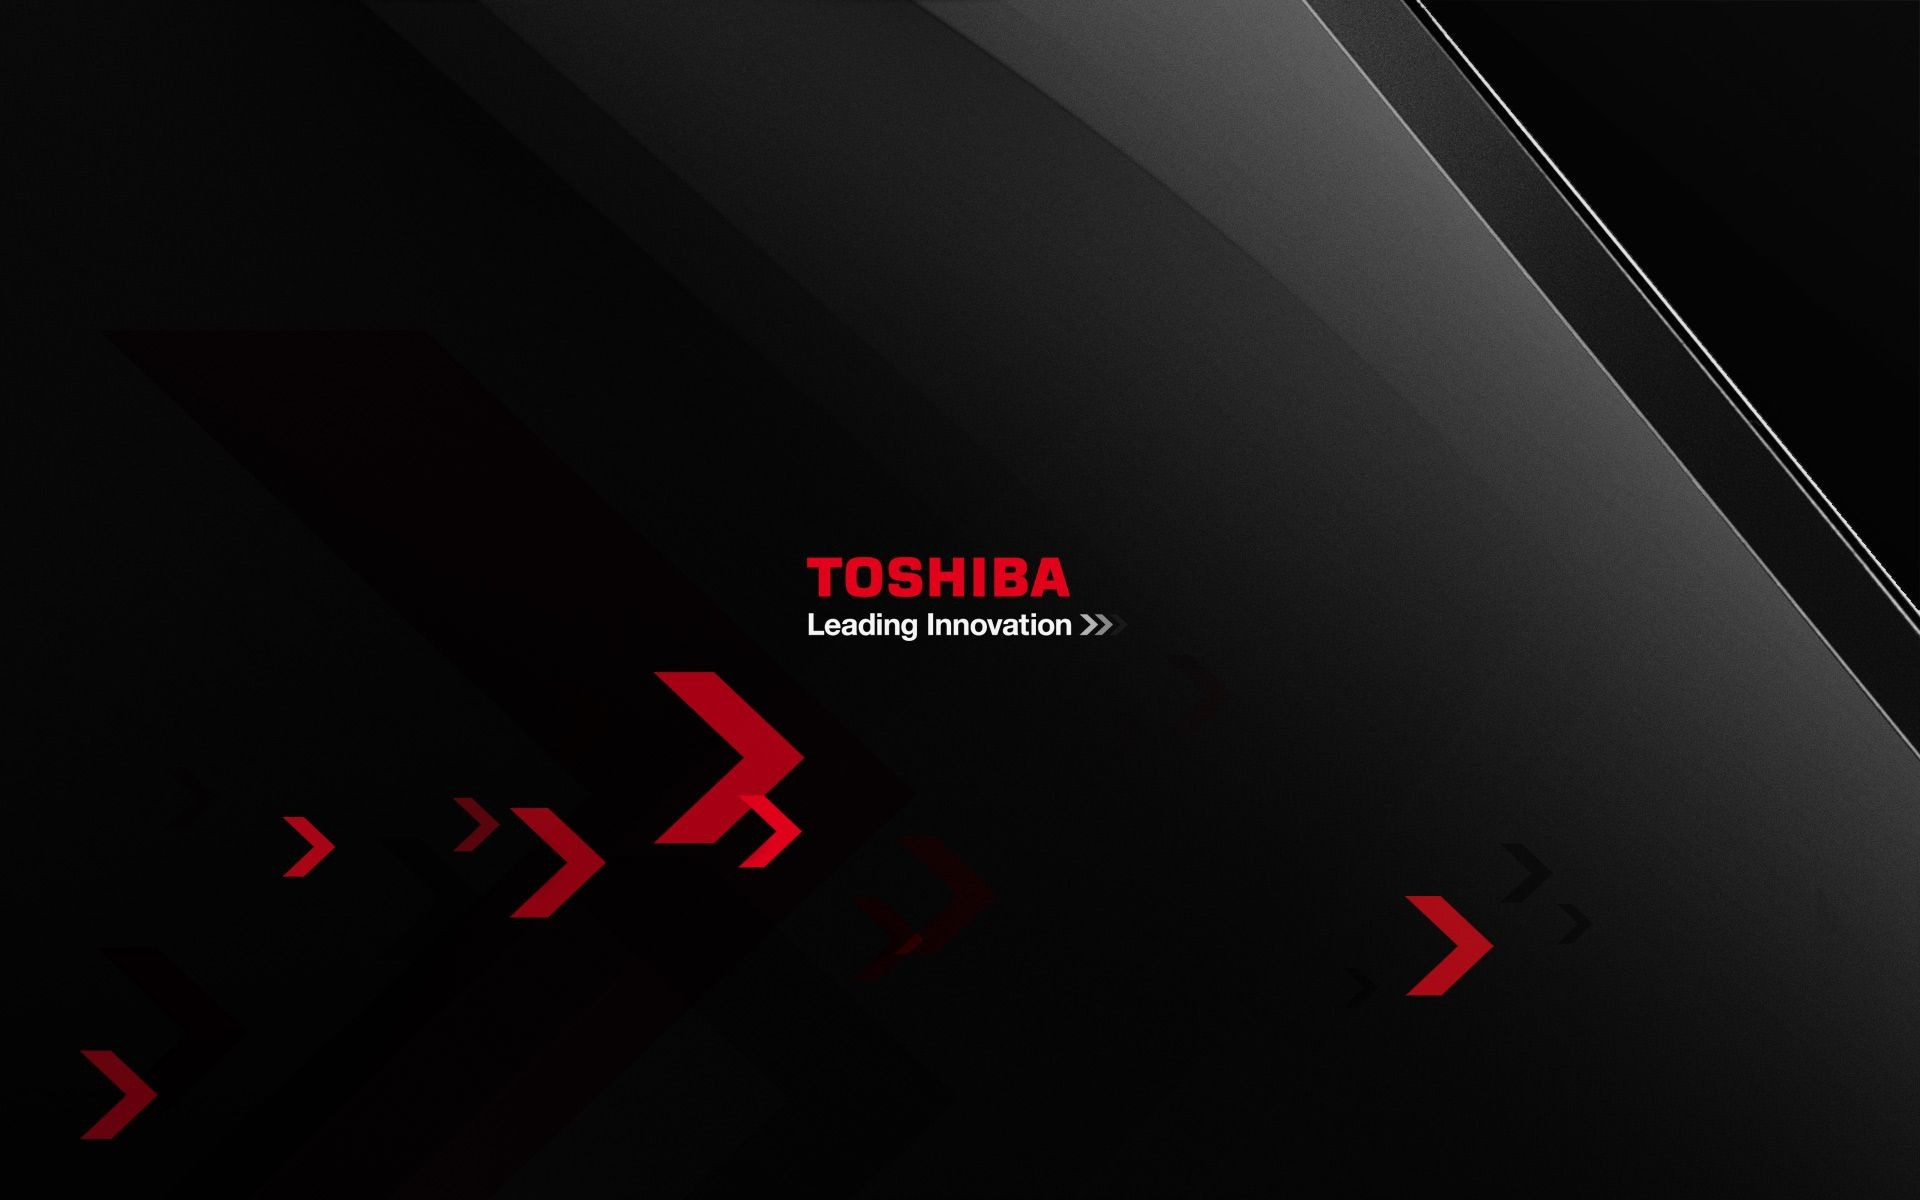 1920x1200 toshiba wallpapers full hd wallpaper search